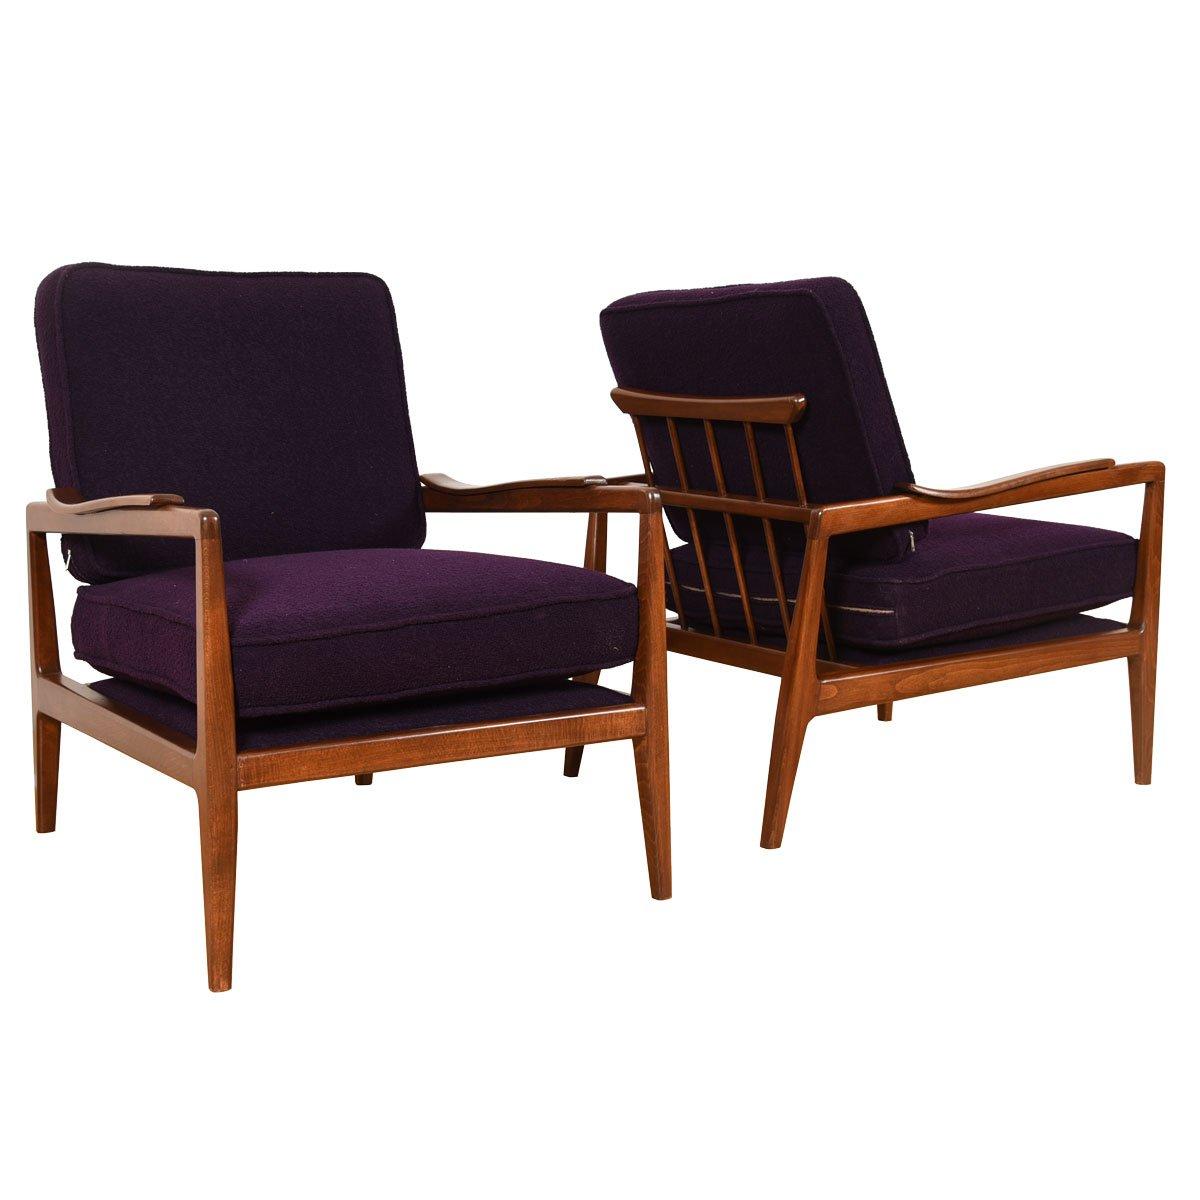 Pair of mid century modern walnut lounge chairs